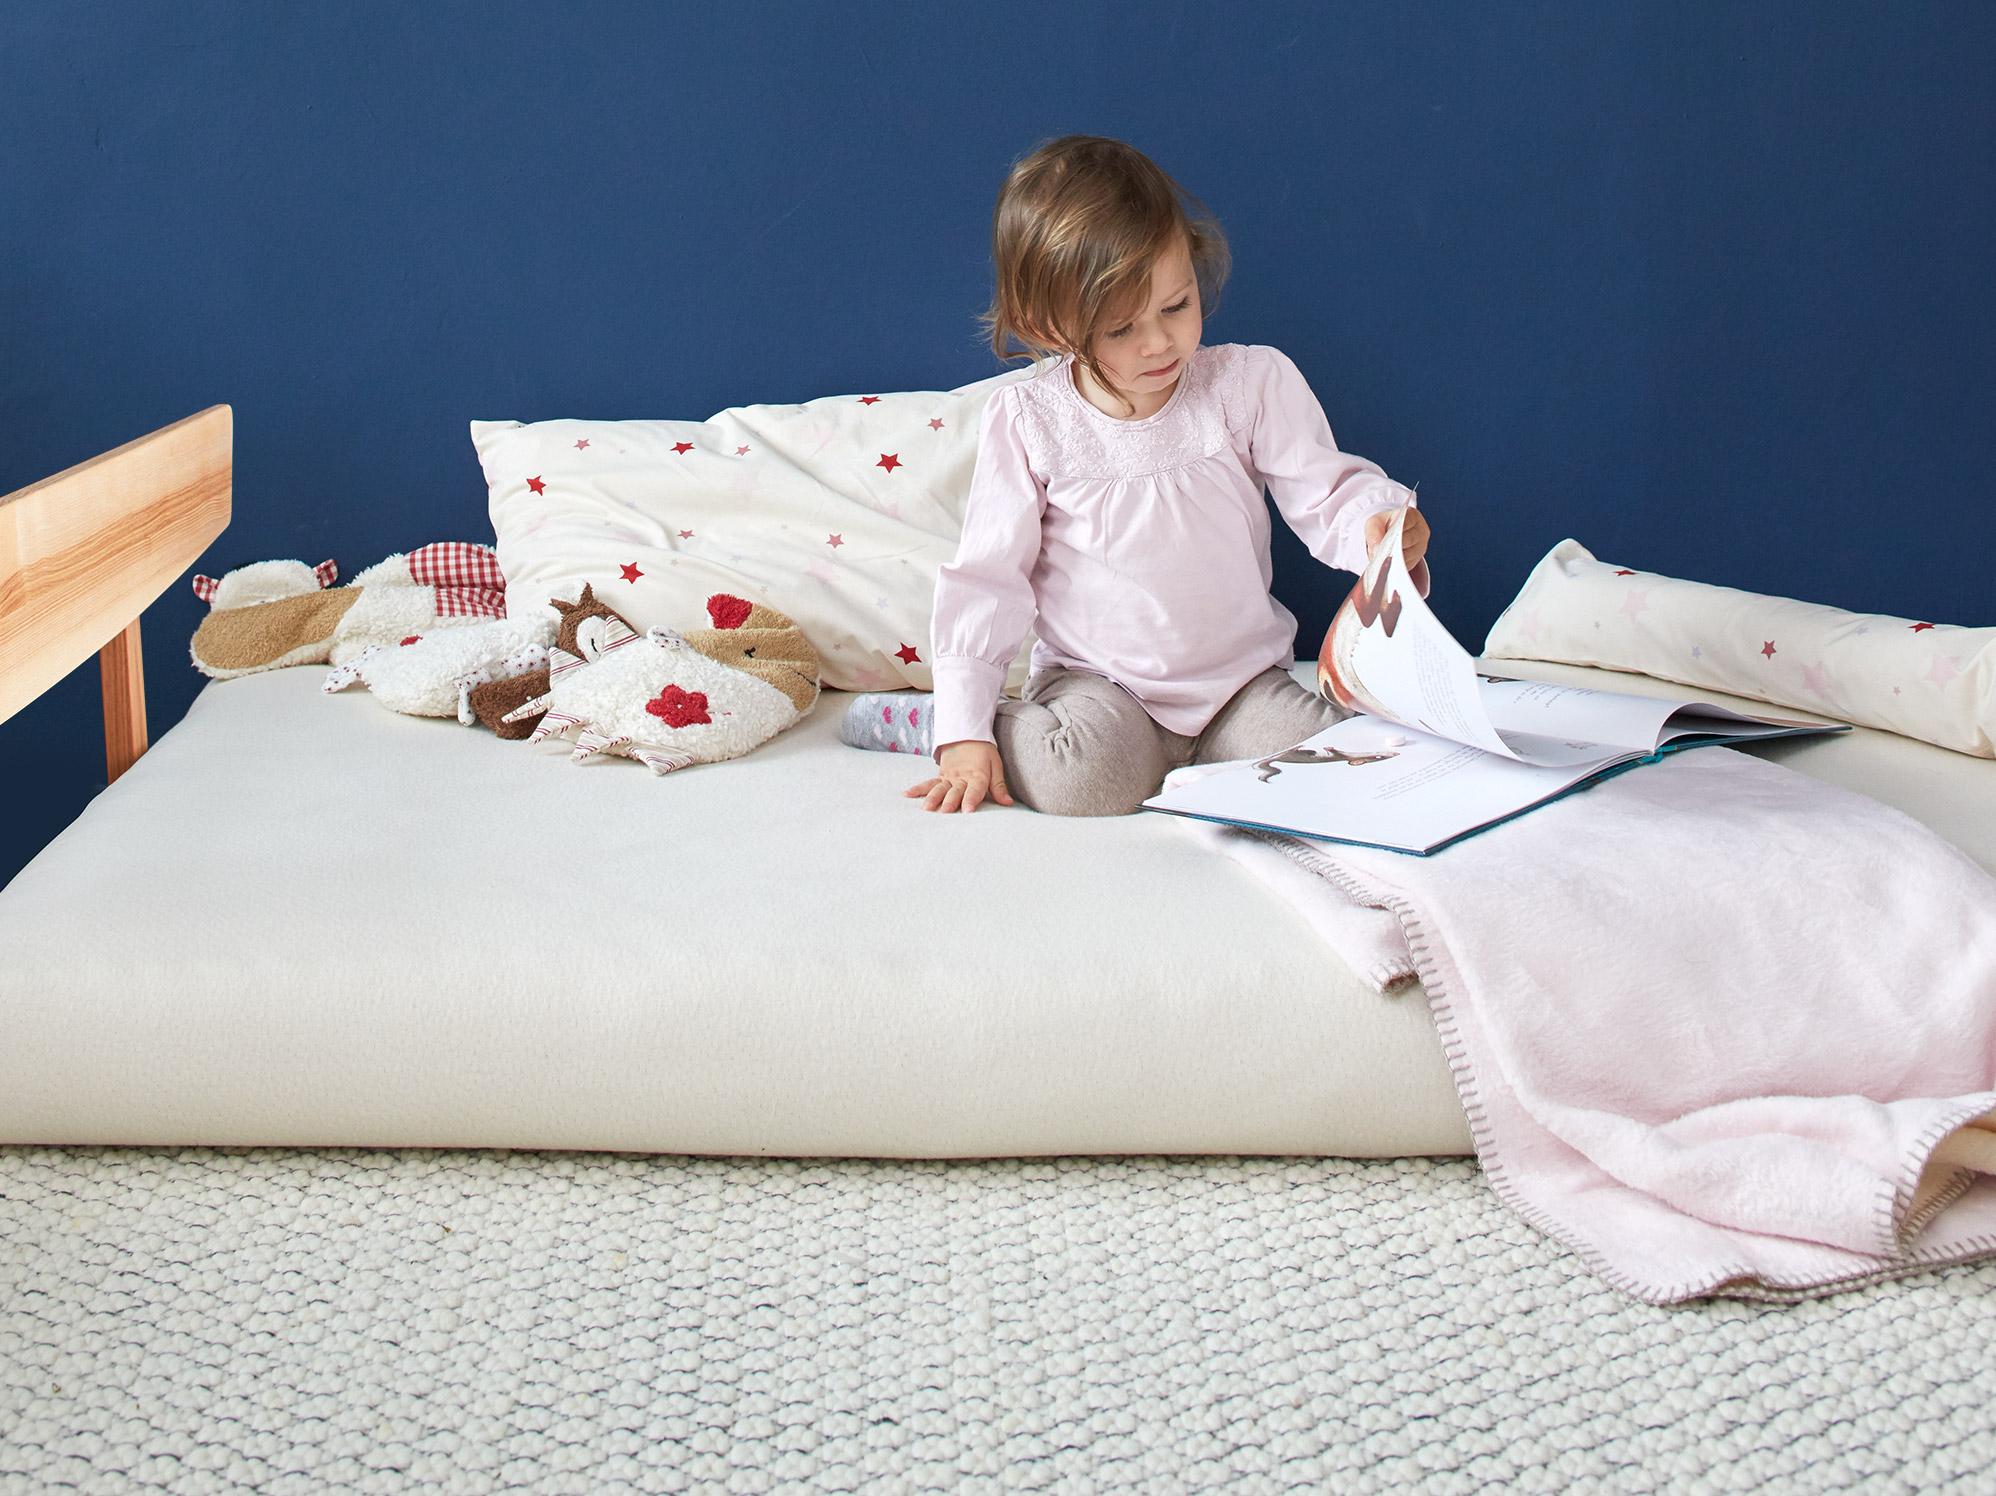 kinderbett matratze 90x200 with kinderbett matratze. Black Bedroom Furniture Sets. Home Design Ideas